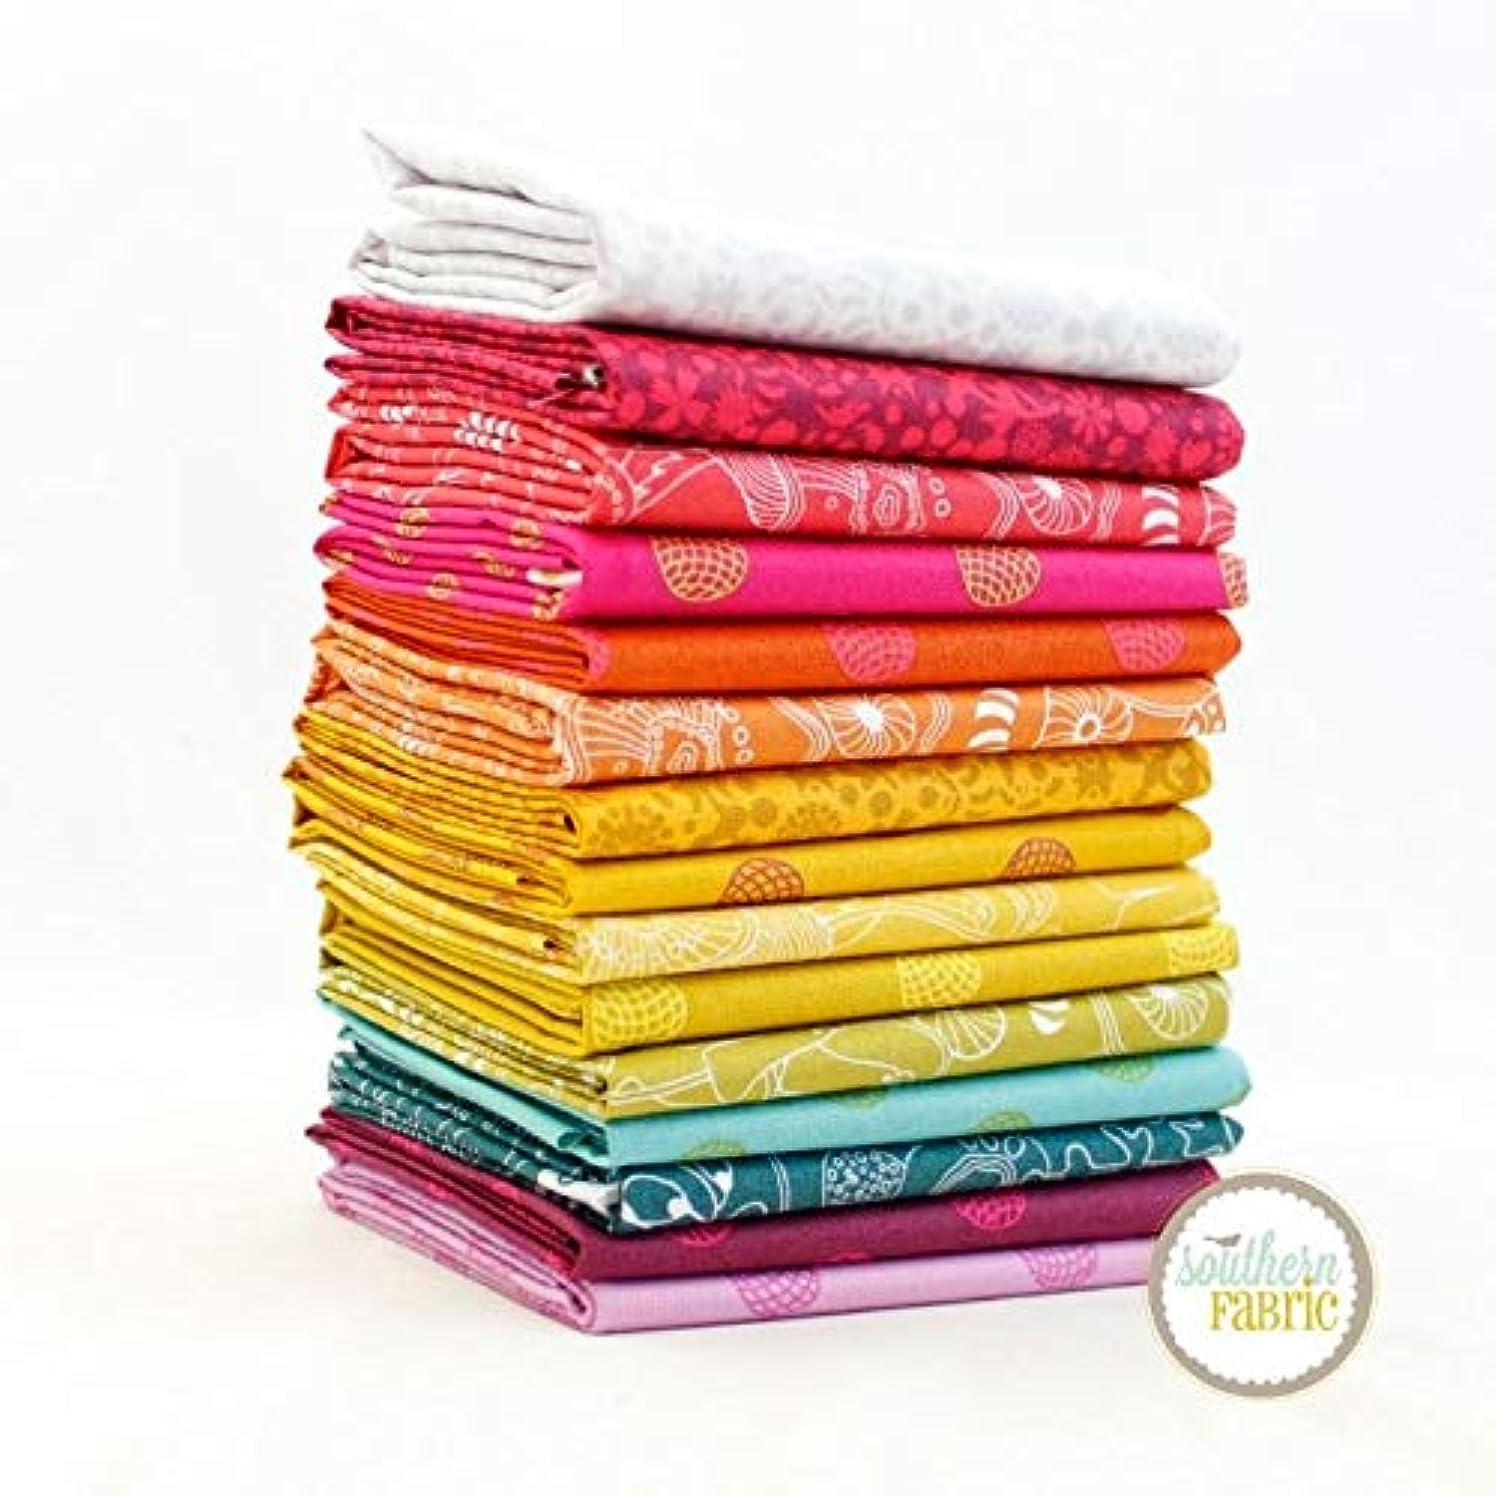 Andover Sun Print 2016 Fat Quarter Bundle (15 pcs) by Alison Glass 18 x 21 inches (45.72cm x 53.34cm) Fabric cuts DIY Quilt Fabric